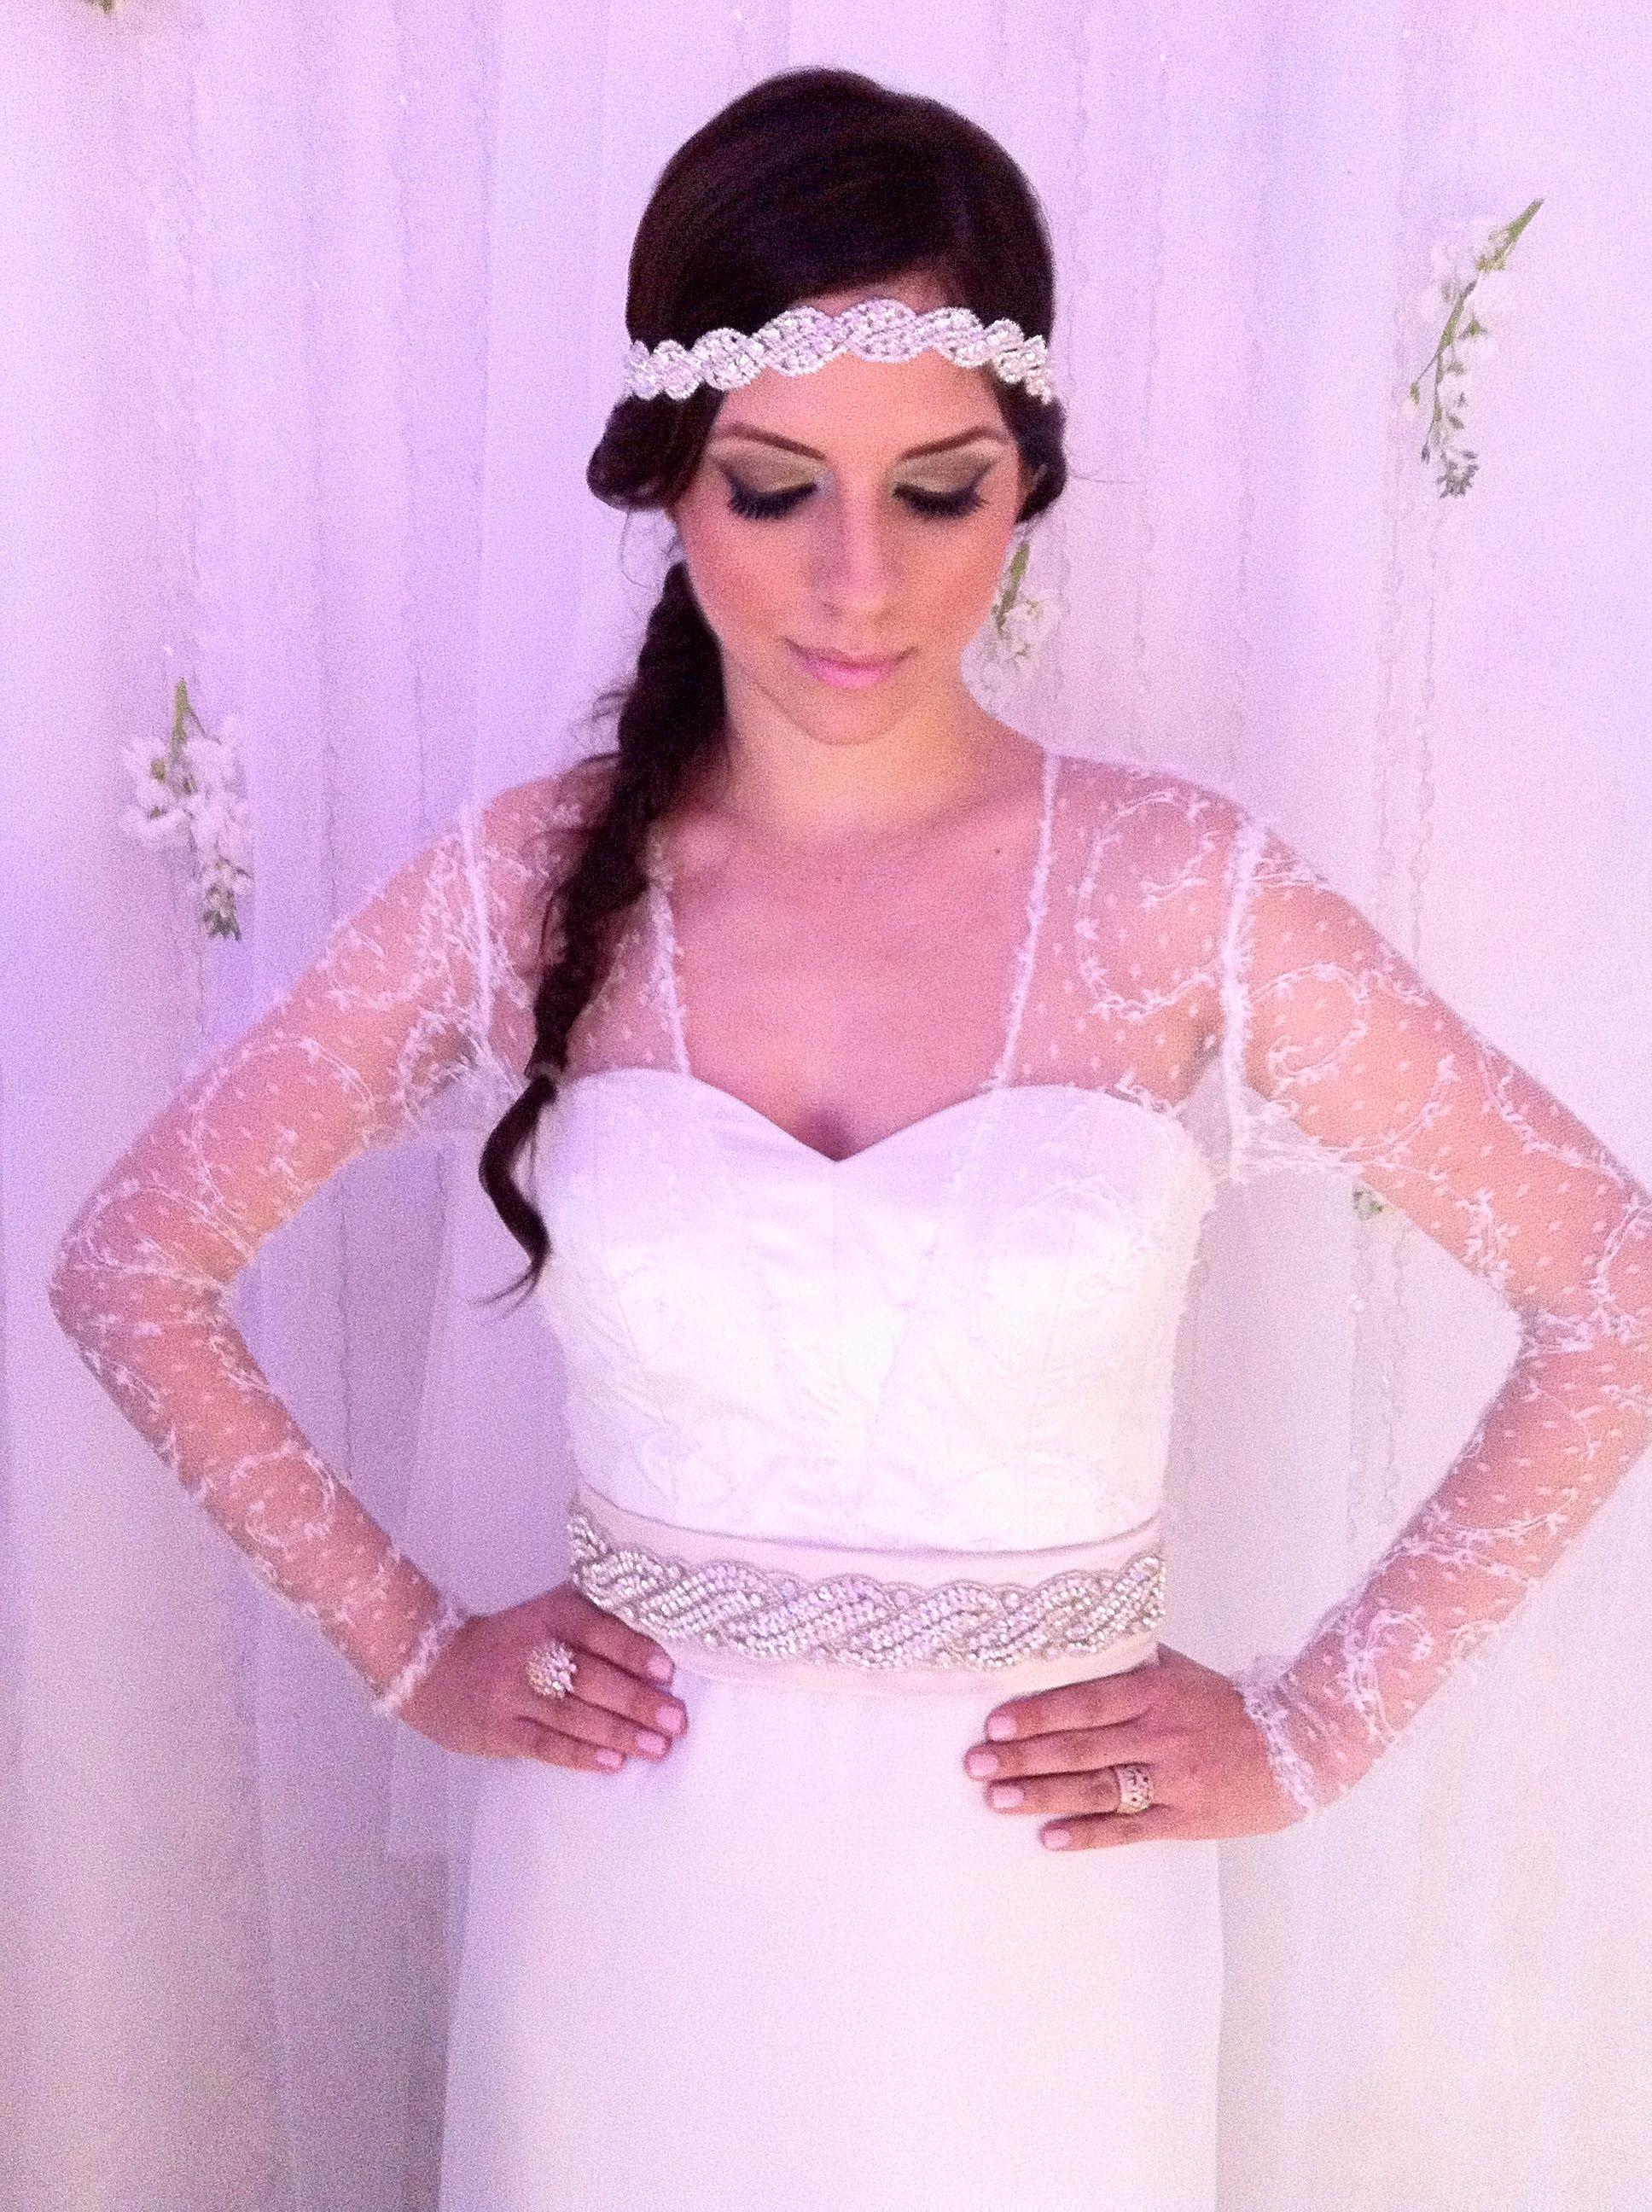 long-sleeved wedding dress by CAROLINA RODRIGUEZ with blush pink ...